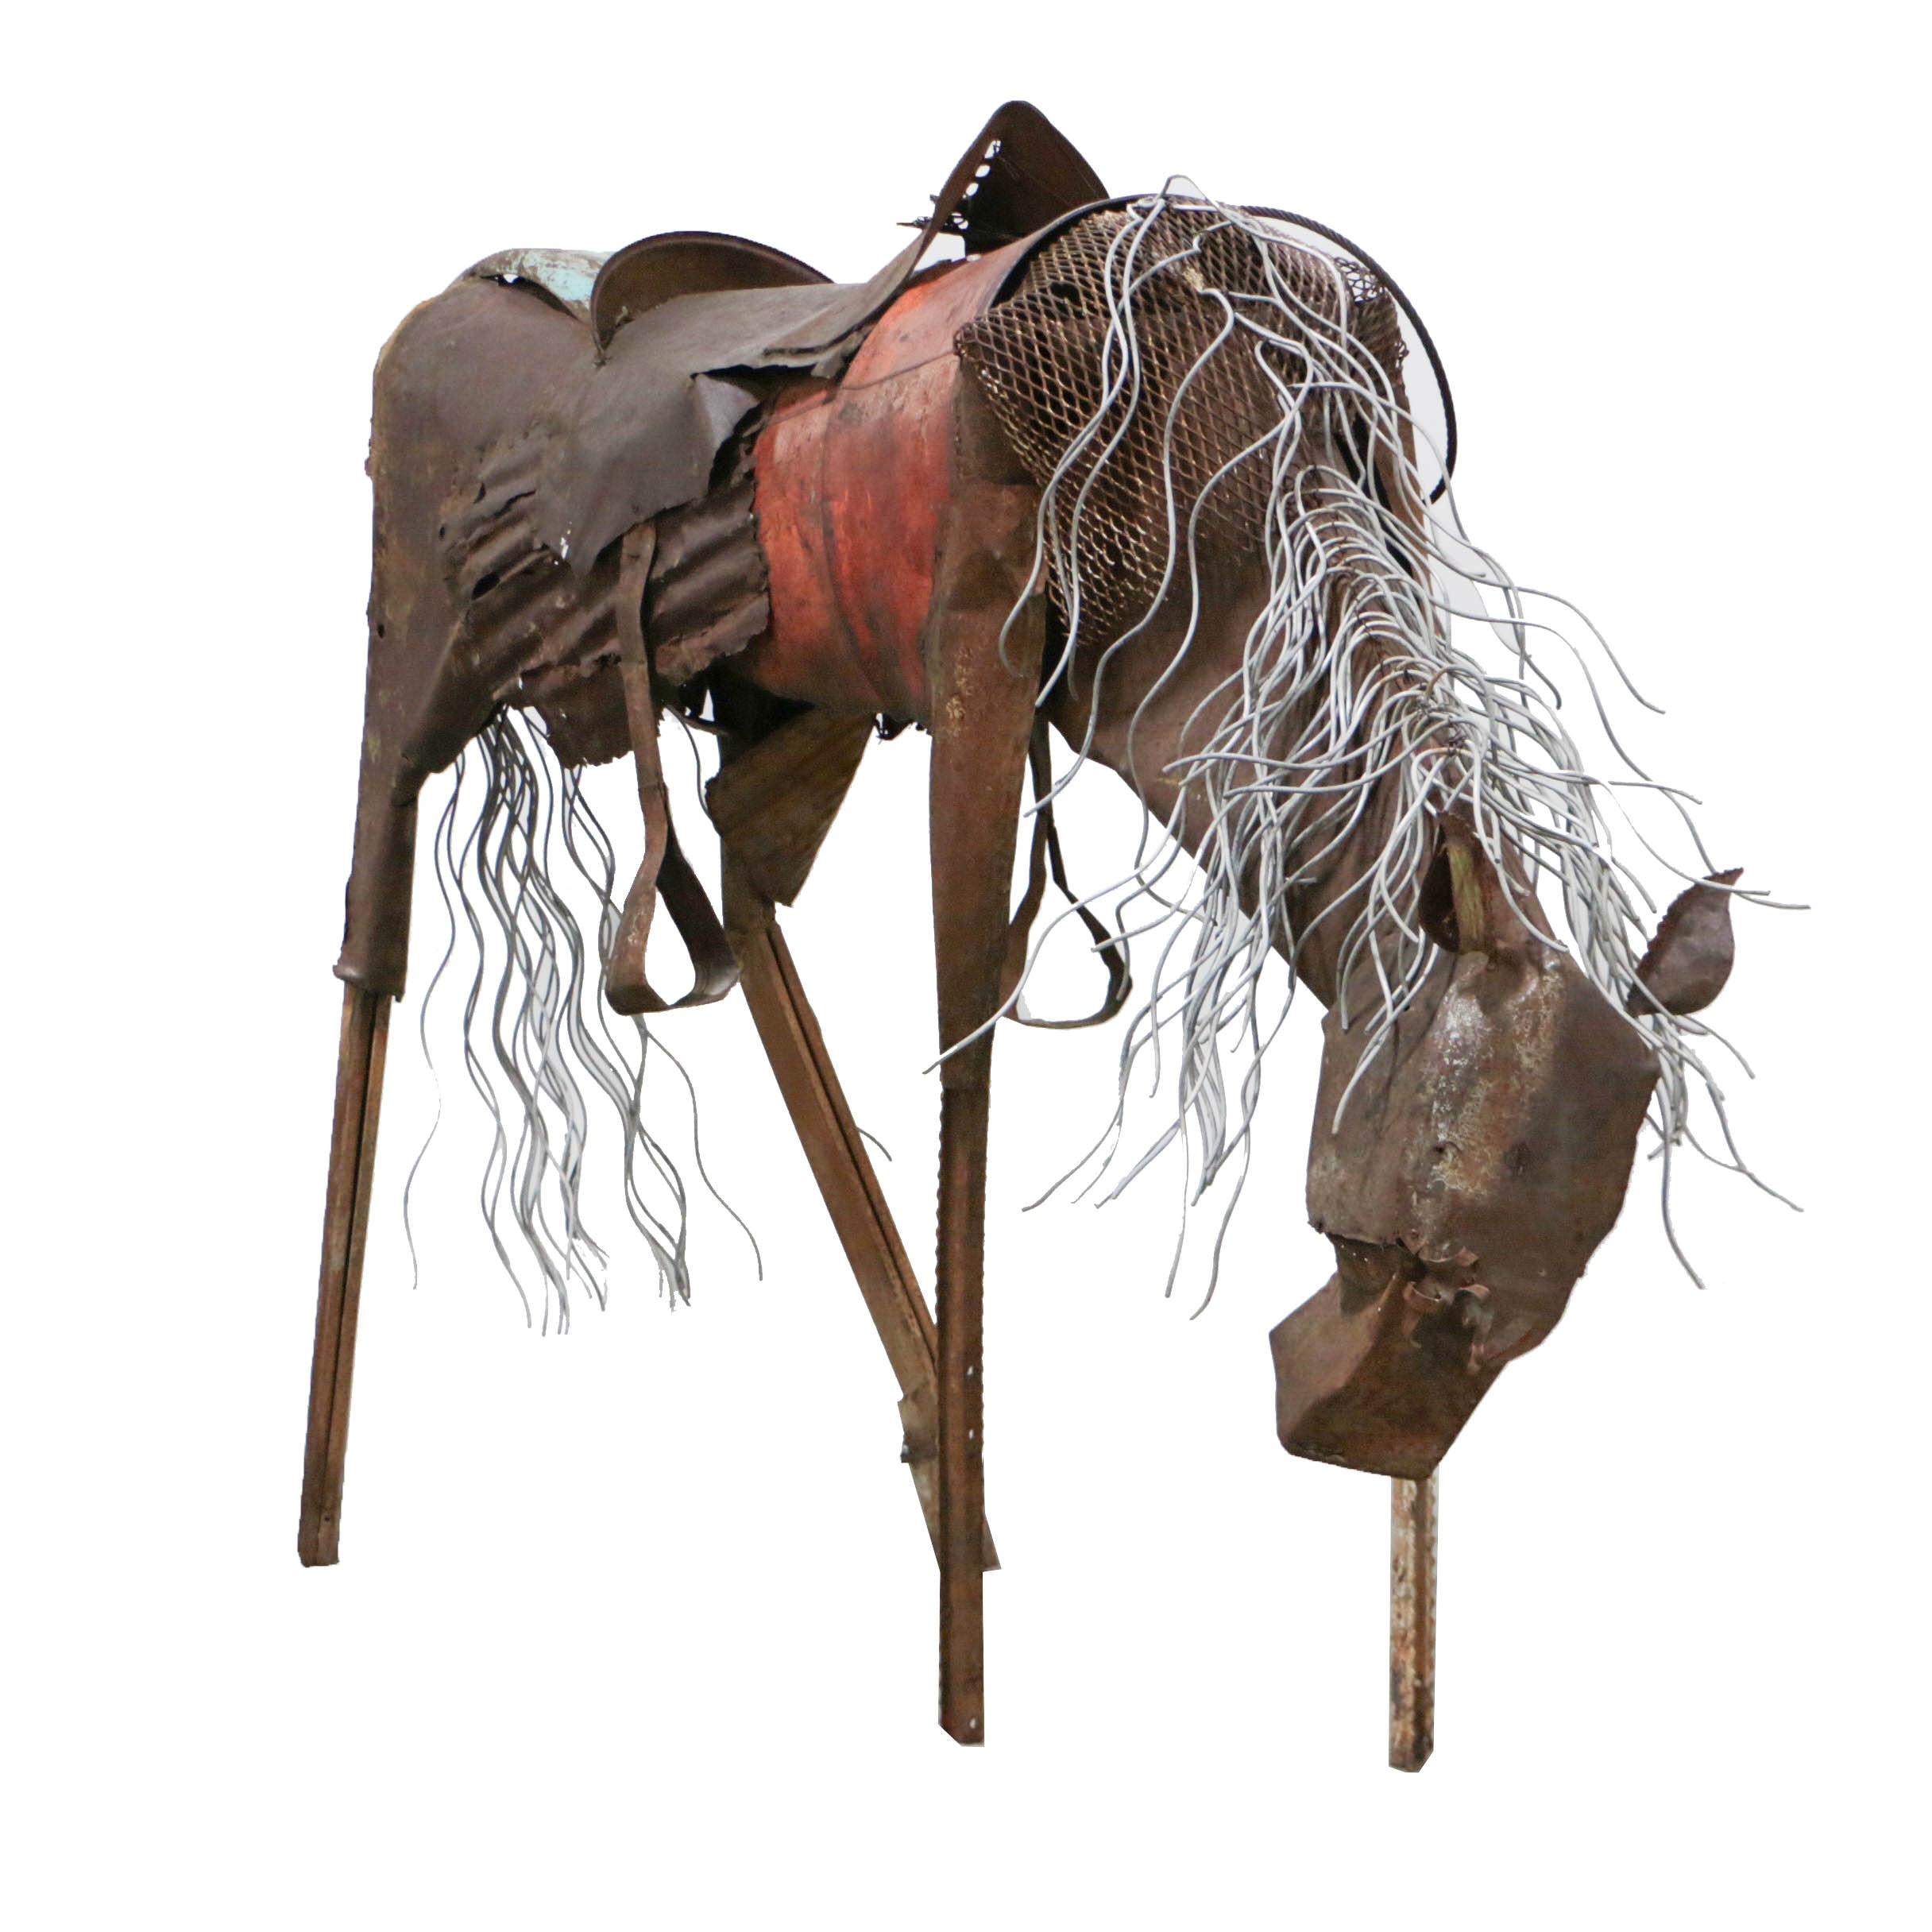 Doug Owen Monumental Recycled Metal Horse Sculpture